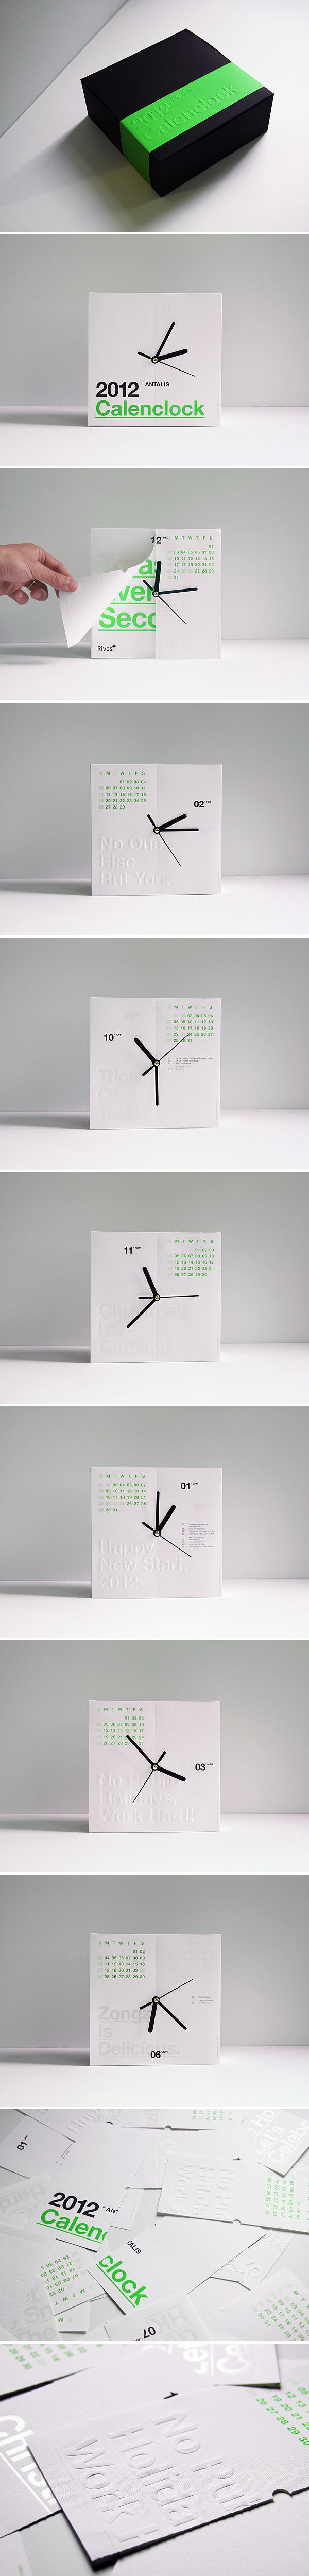 Часы - Календарь («CalenClock»)